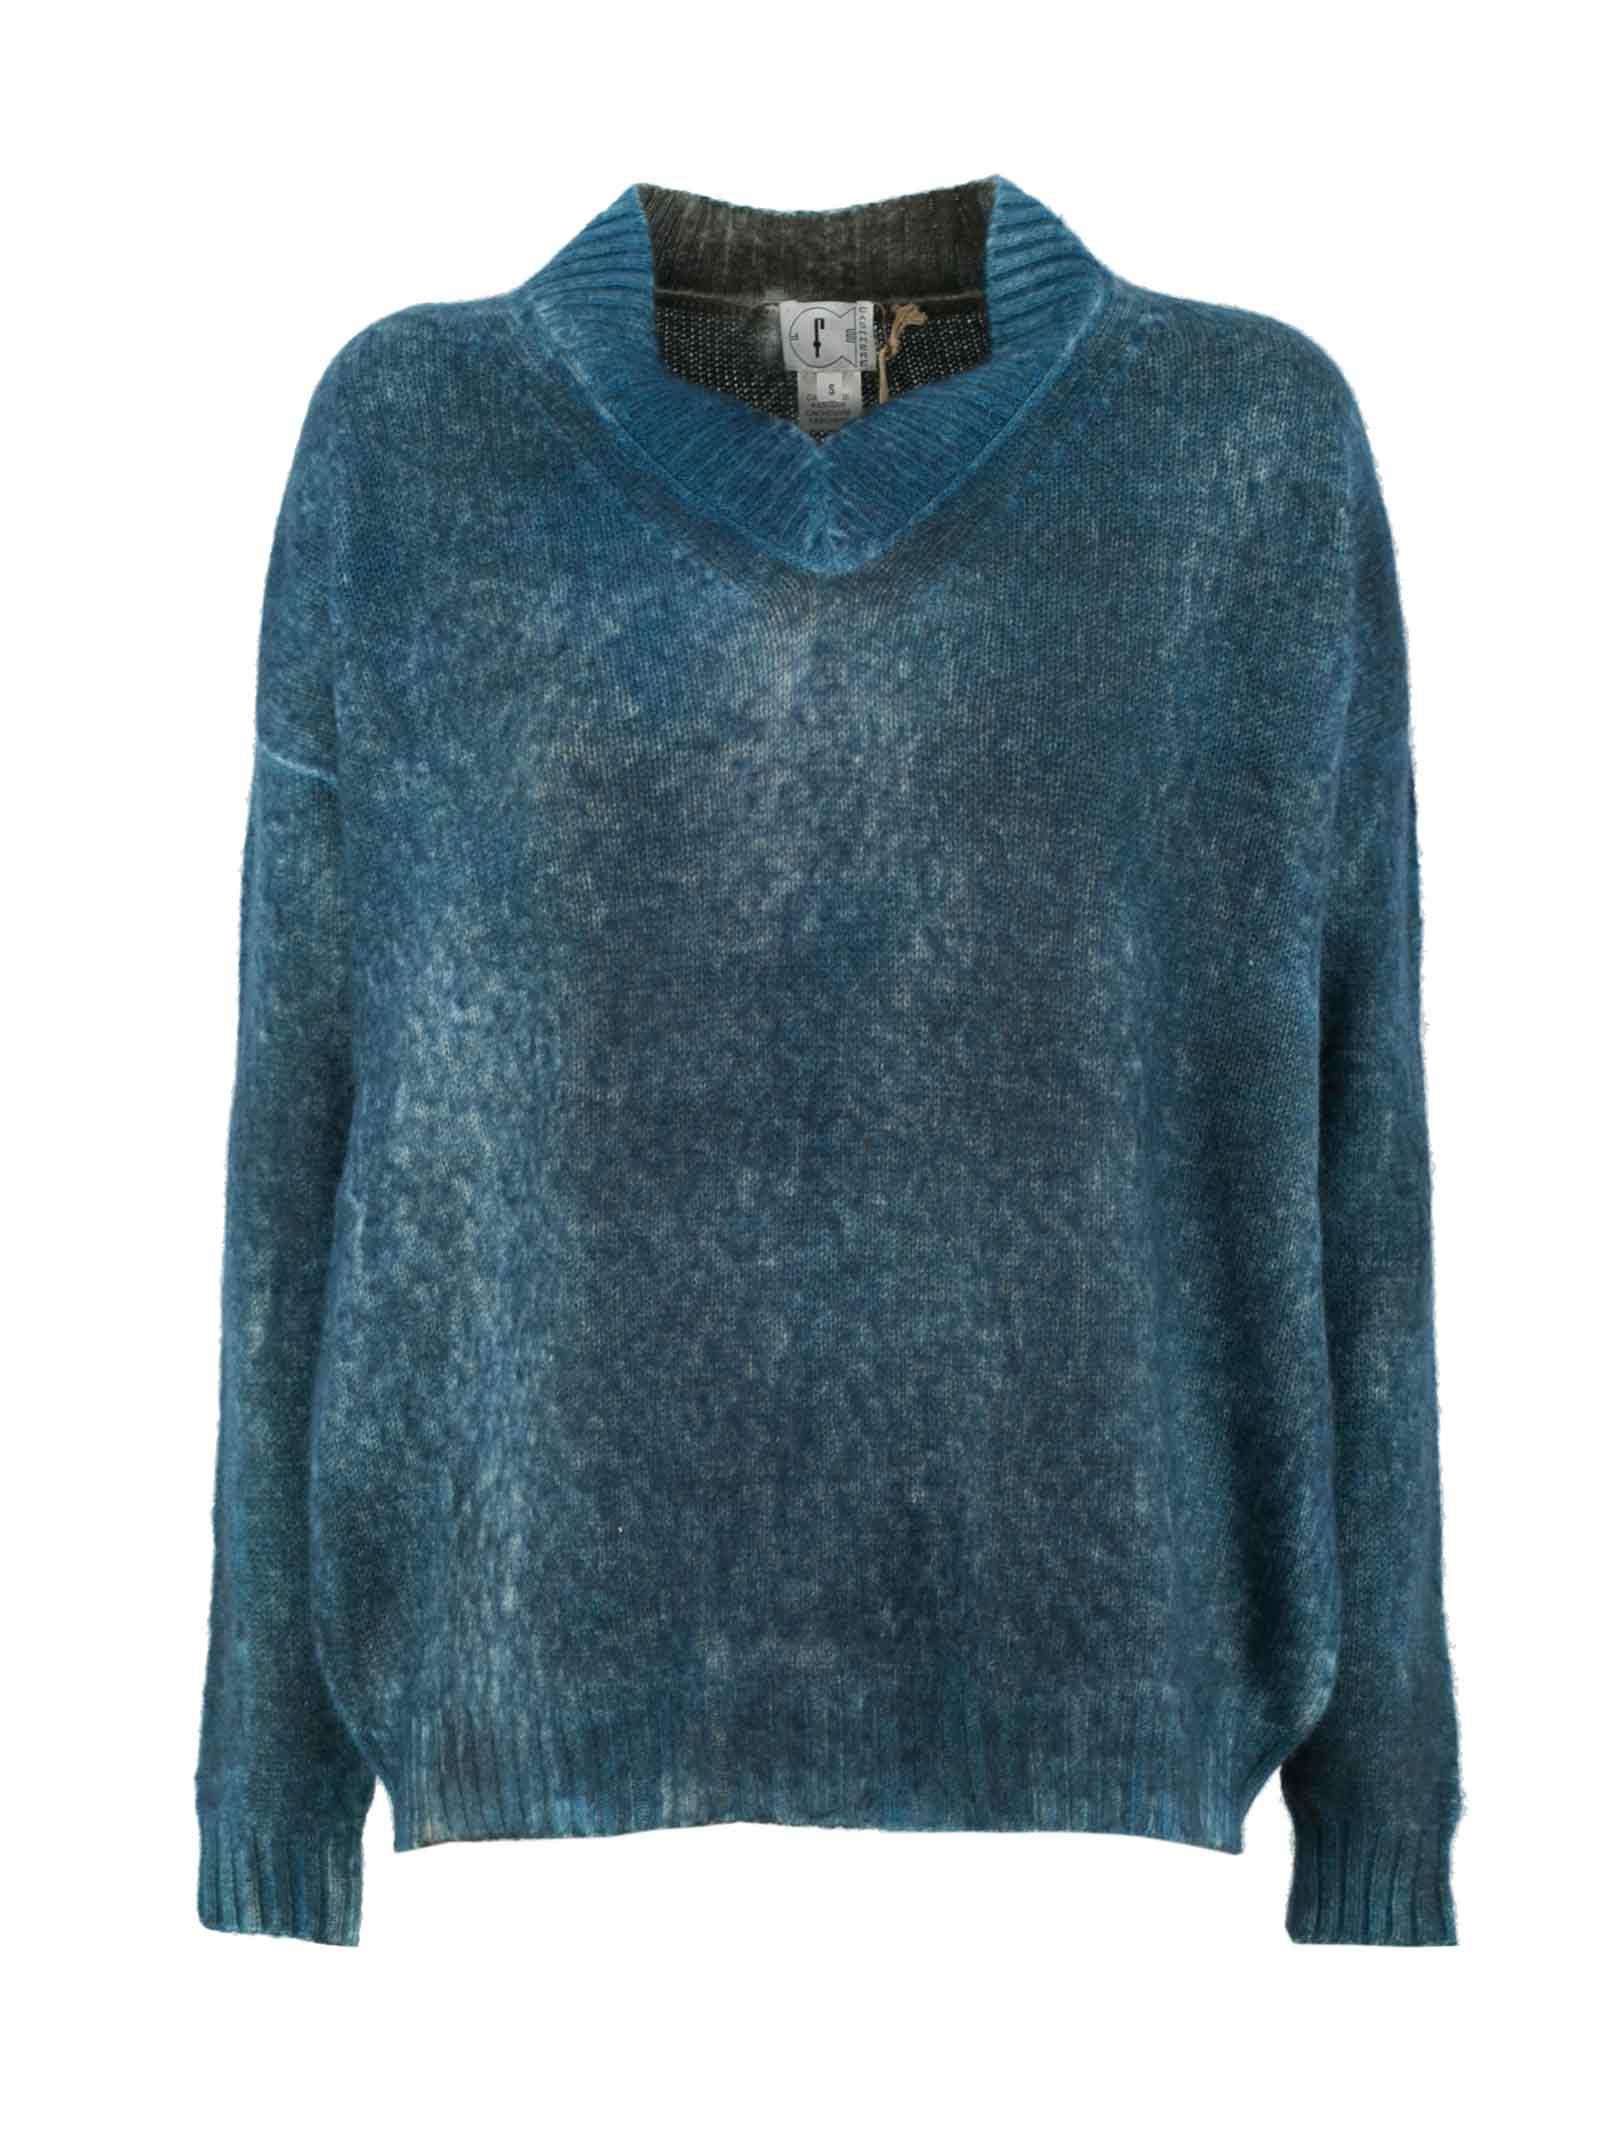 Roun Neck Sweater